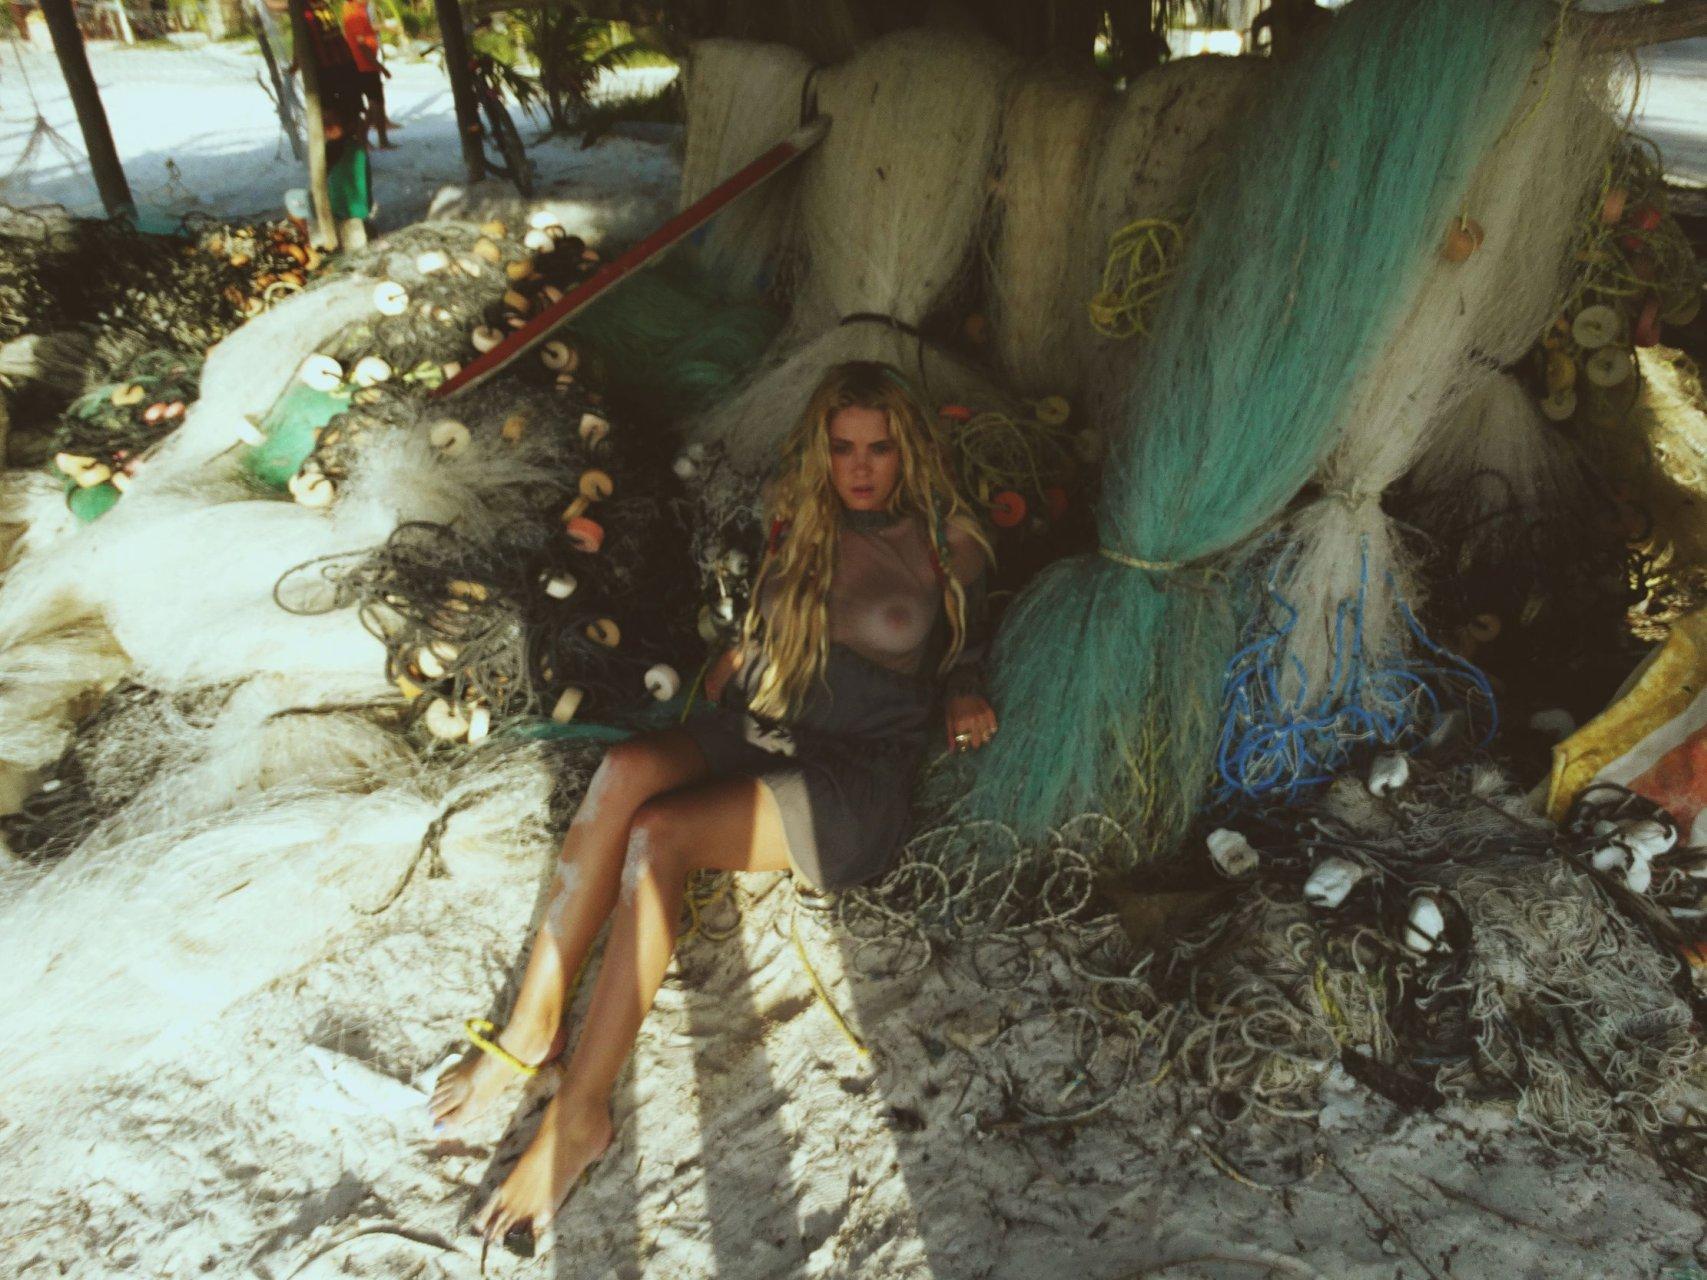 ashley benson's tits (40 photos + gifs) | #thefappening